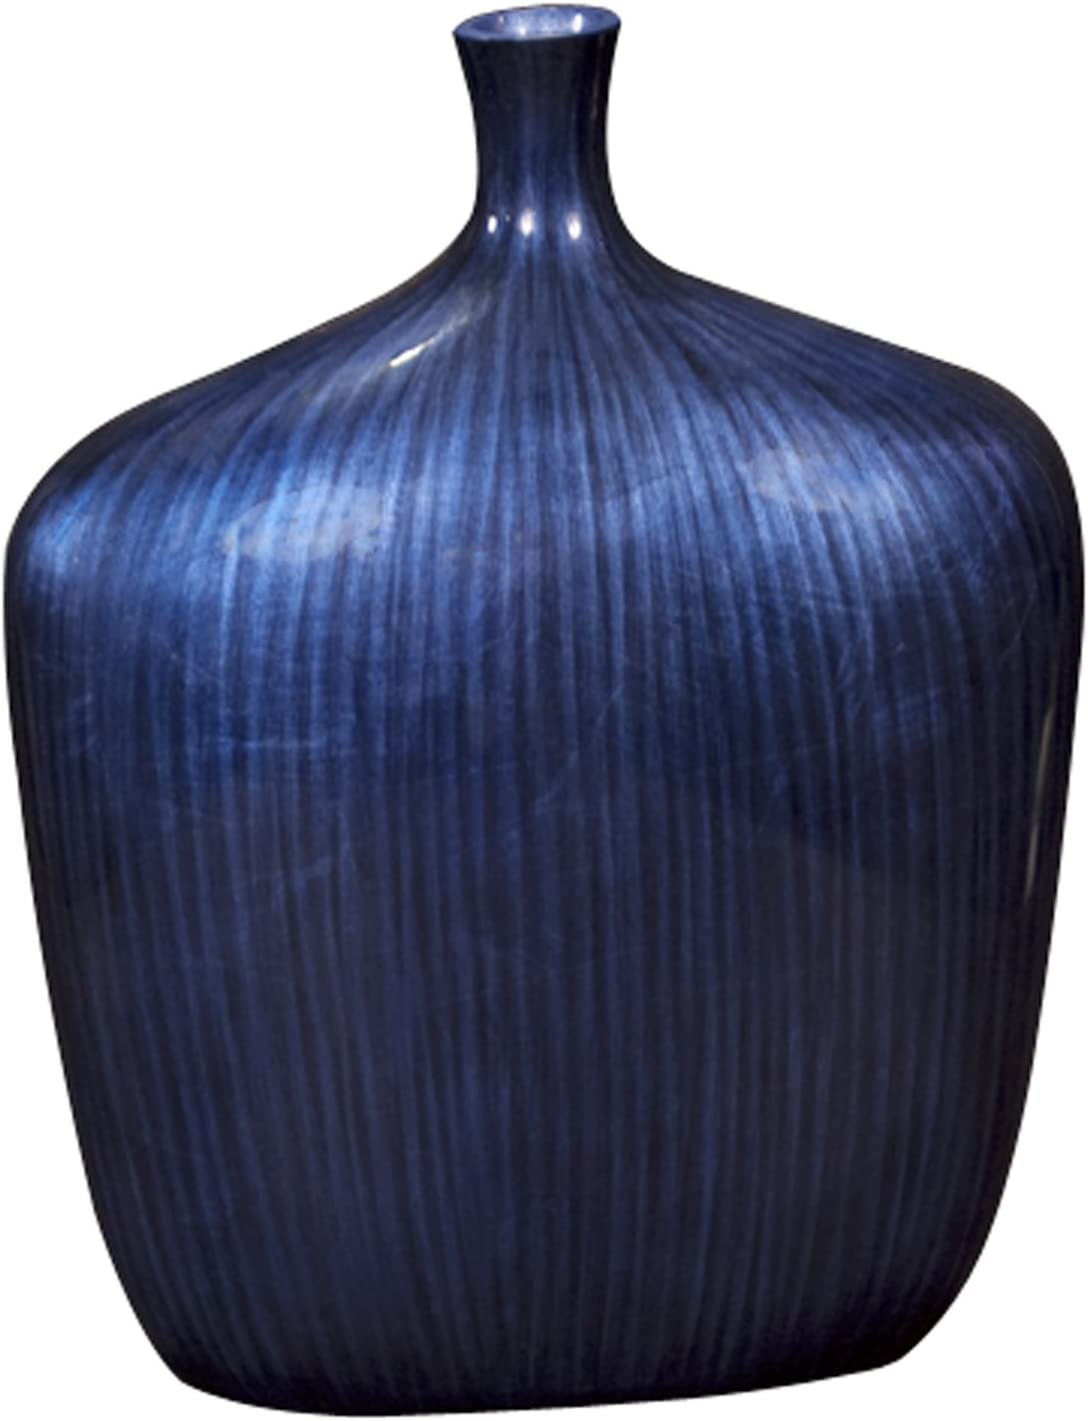 Fashionable Howard Elliott 22076S Sleek Cobalt New product type Vase Blue Small